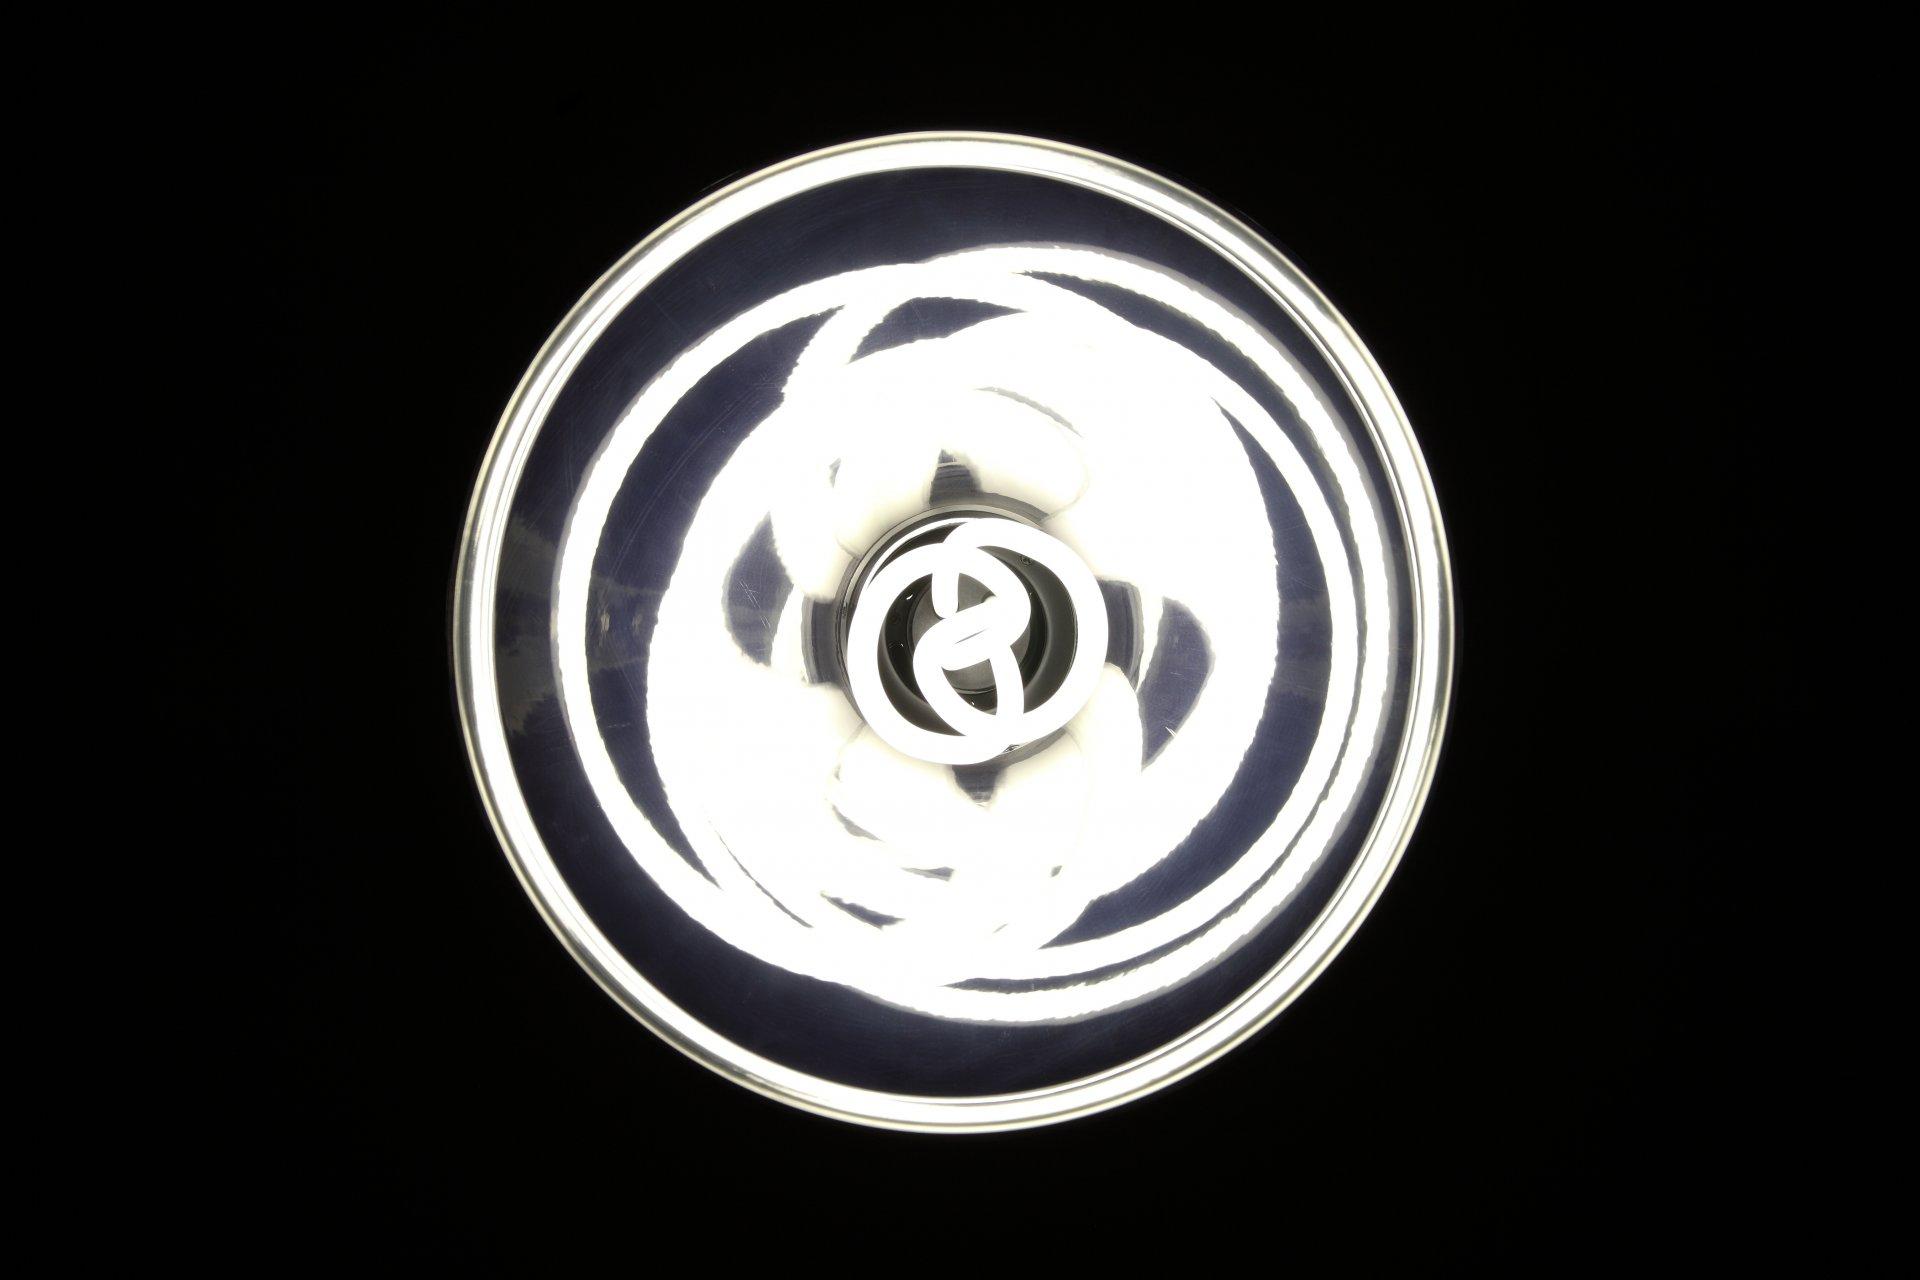 012_Plumen-001-designer-light-bulb-with-Lightyears-Pharoah-lampshade-in-Ibis-hotel__4_ Pharaoh Hulger